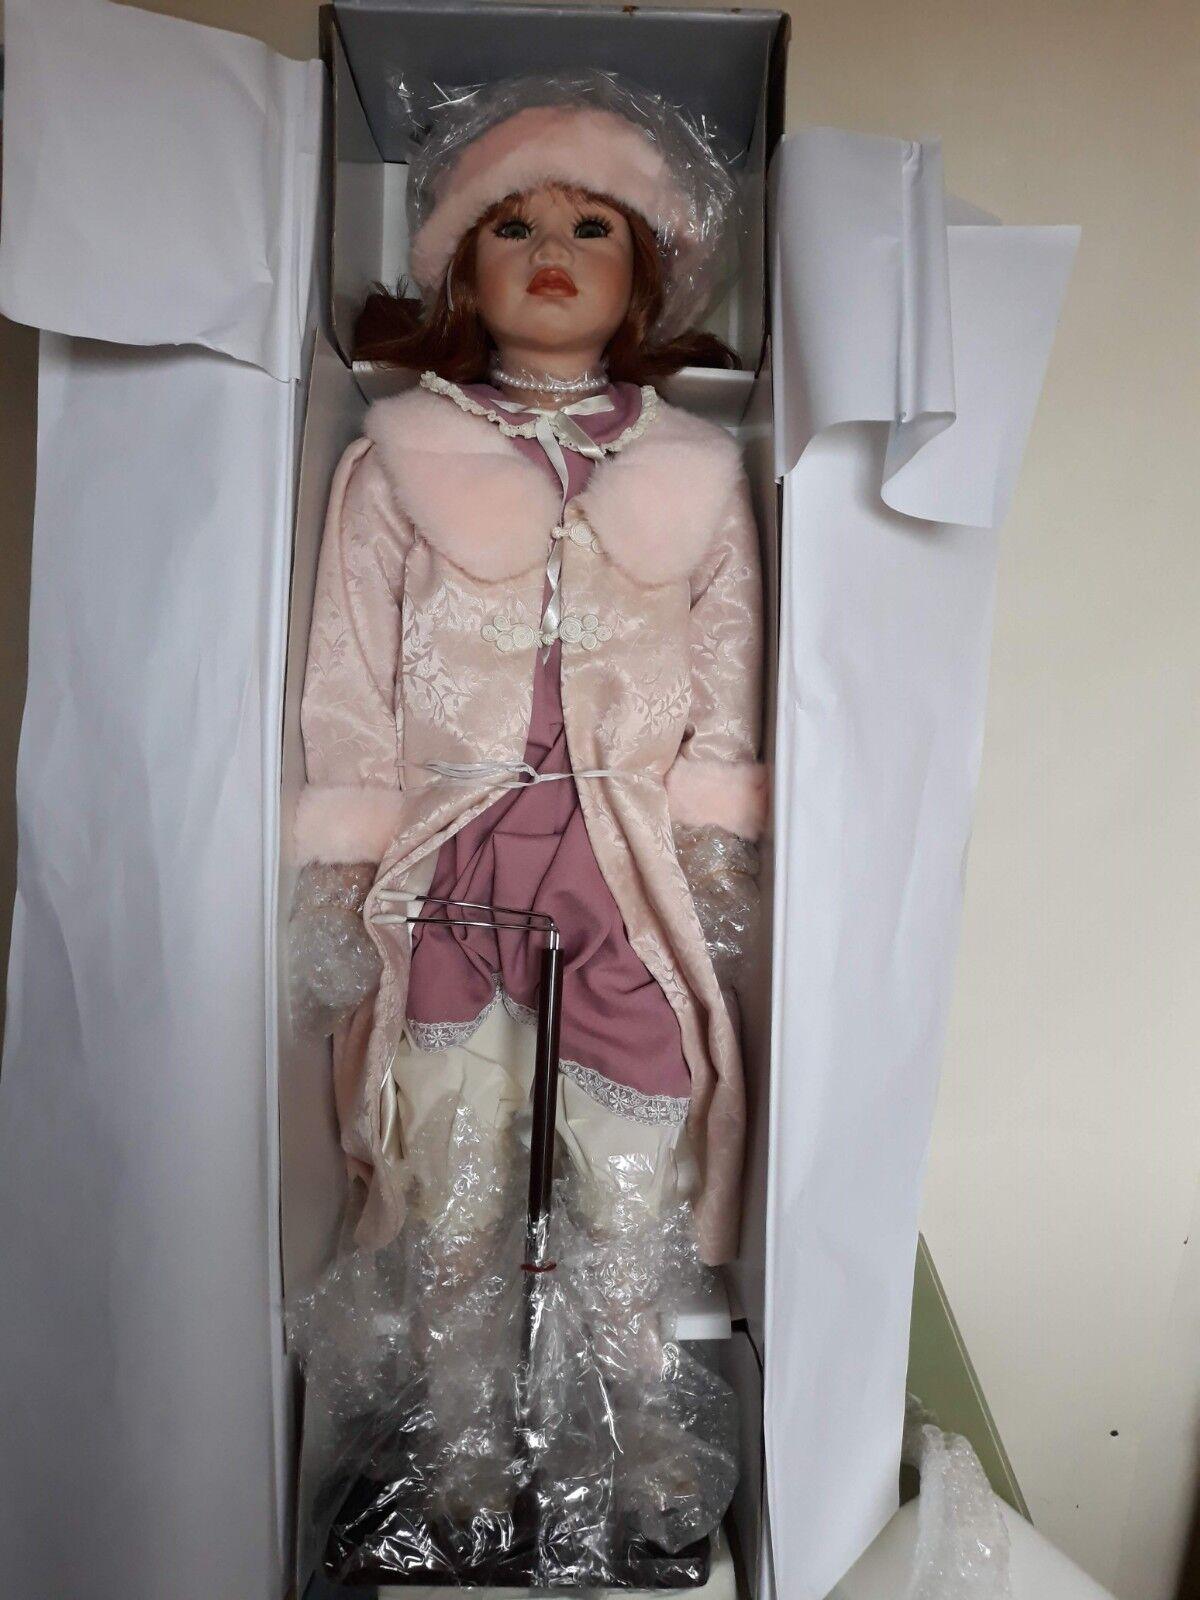 Original de porcelana artistas muñeca angel  s paradise año 2000